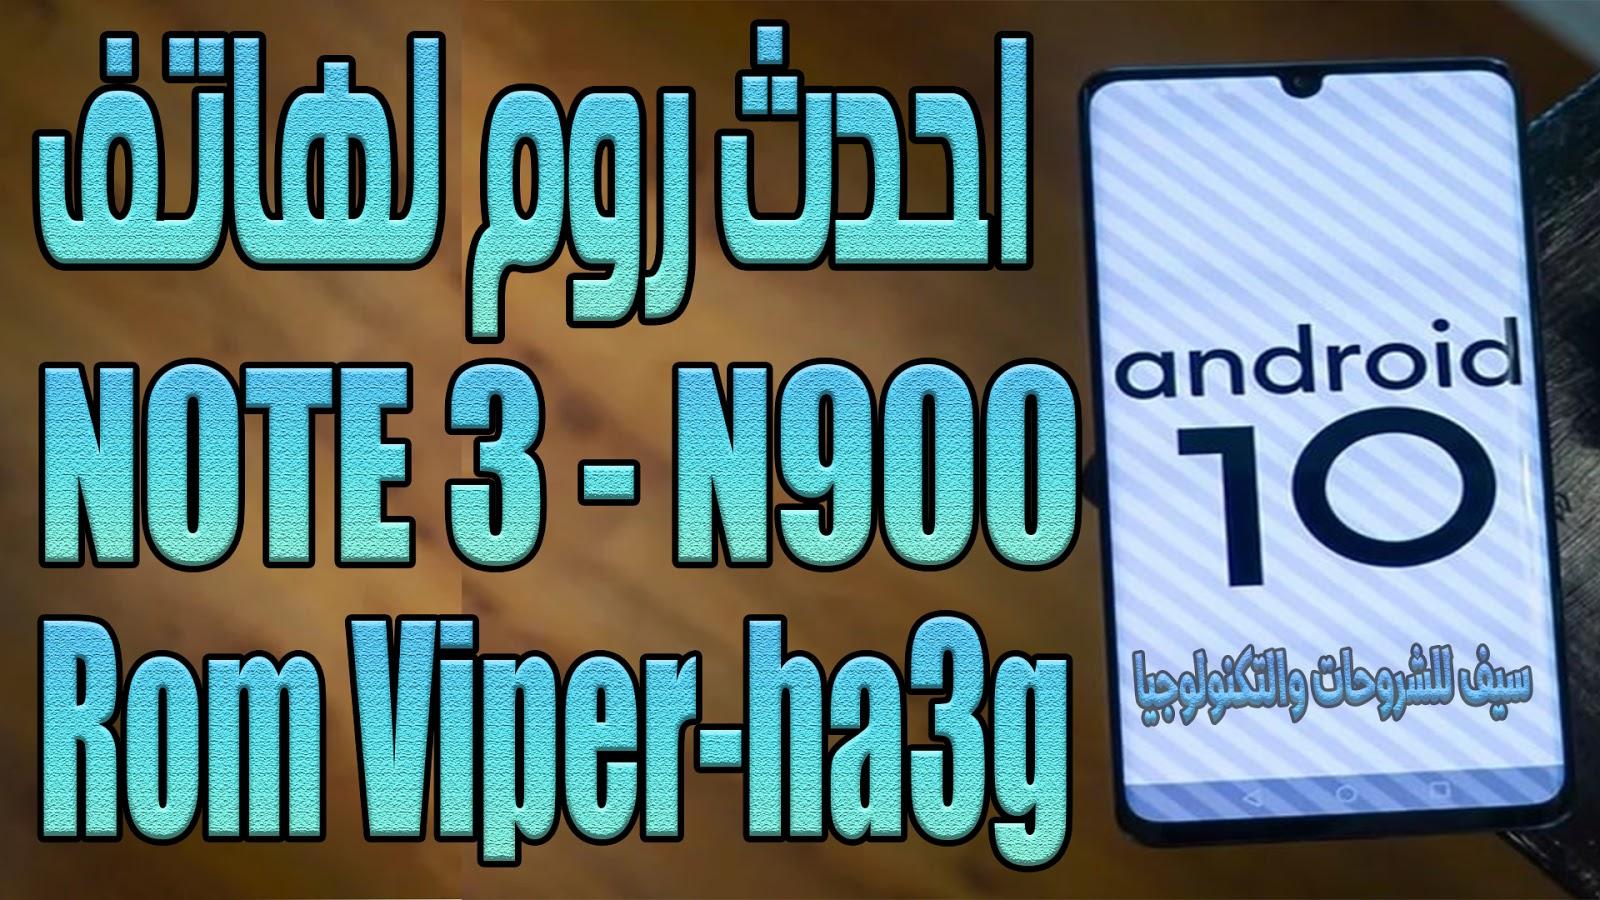 تحميل احدث روم Viper-ha3g لهاتف NOTE 3 - N900 بأمكانيات خرافية - Rom NOTE 10 For NOTE 3 - N900